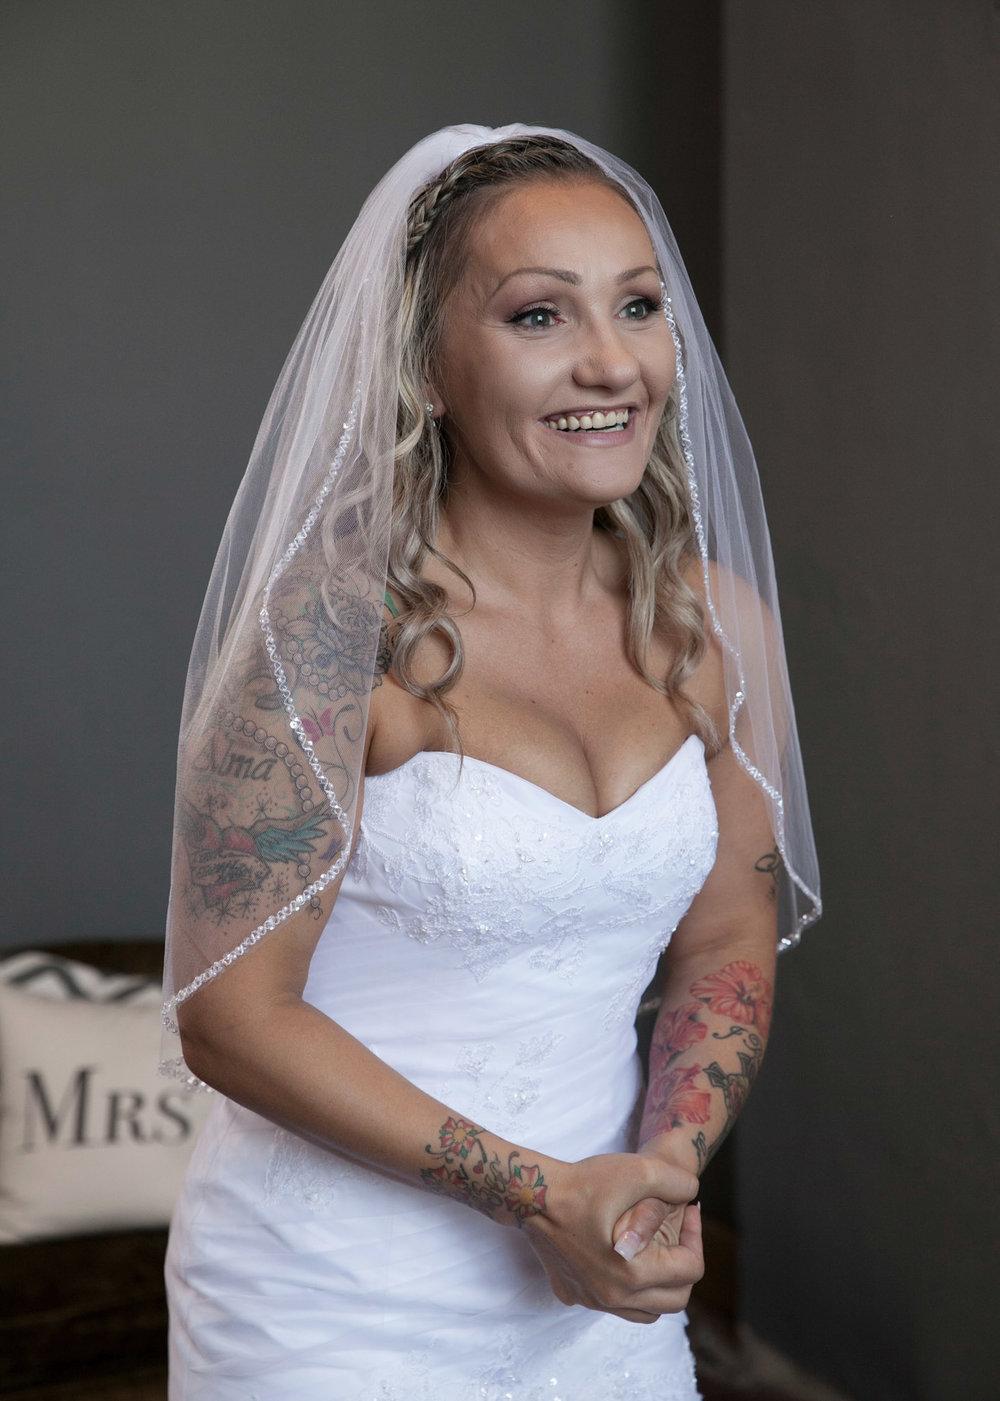 Kansas_City_Small_Wedding_Venue_Elope_Intimate_Ceremony_Budget_Affordable_081A&J.jpg